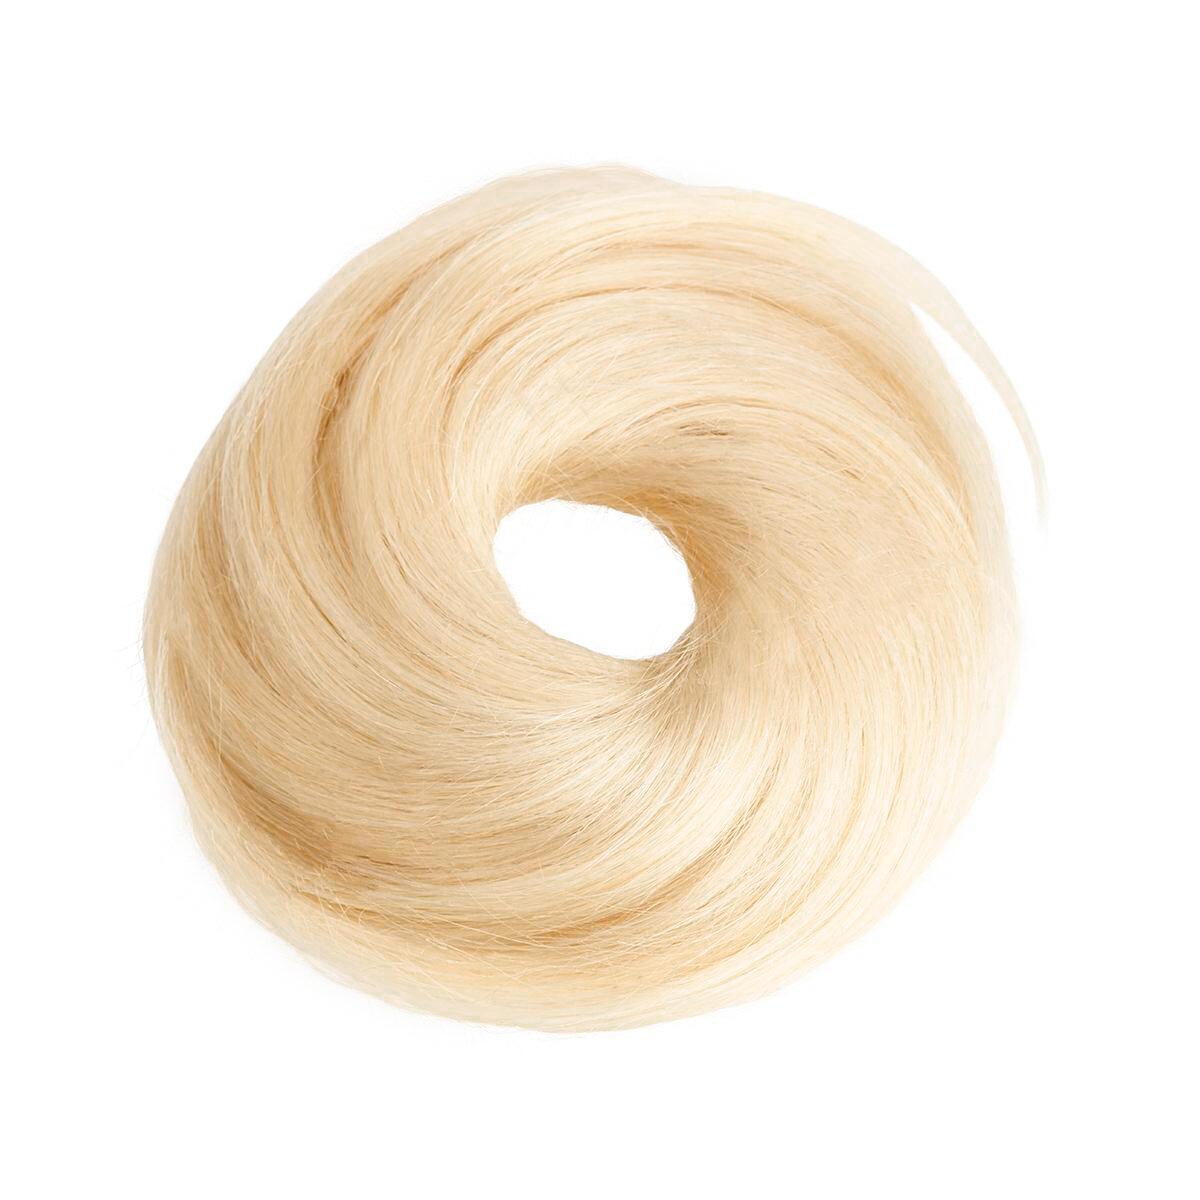 Volume Hair Scrunchie Original 40 g 8.0 Light Golden Blonde 0 cm